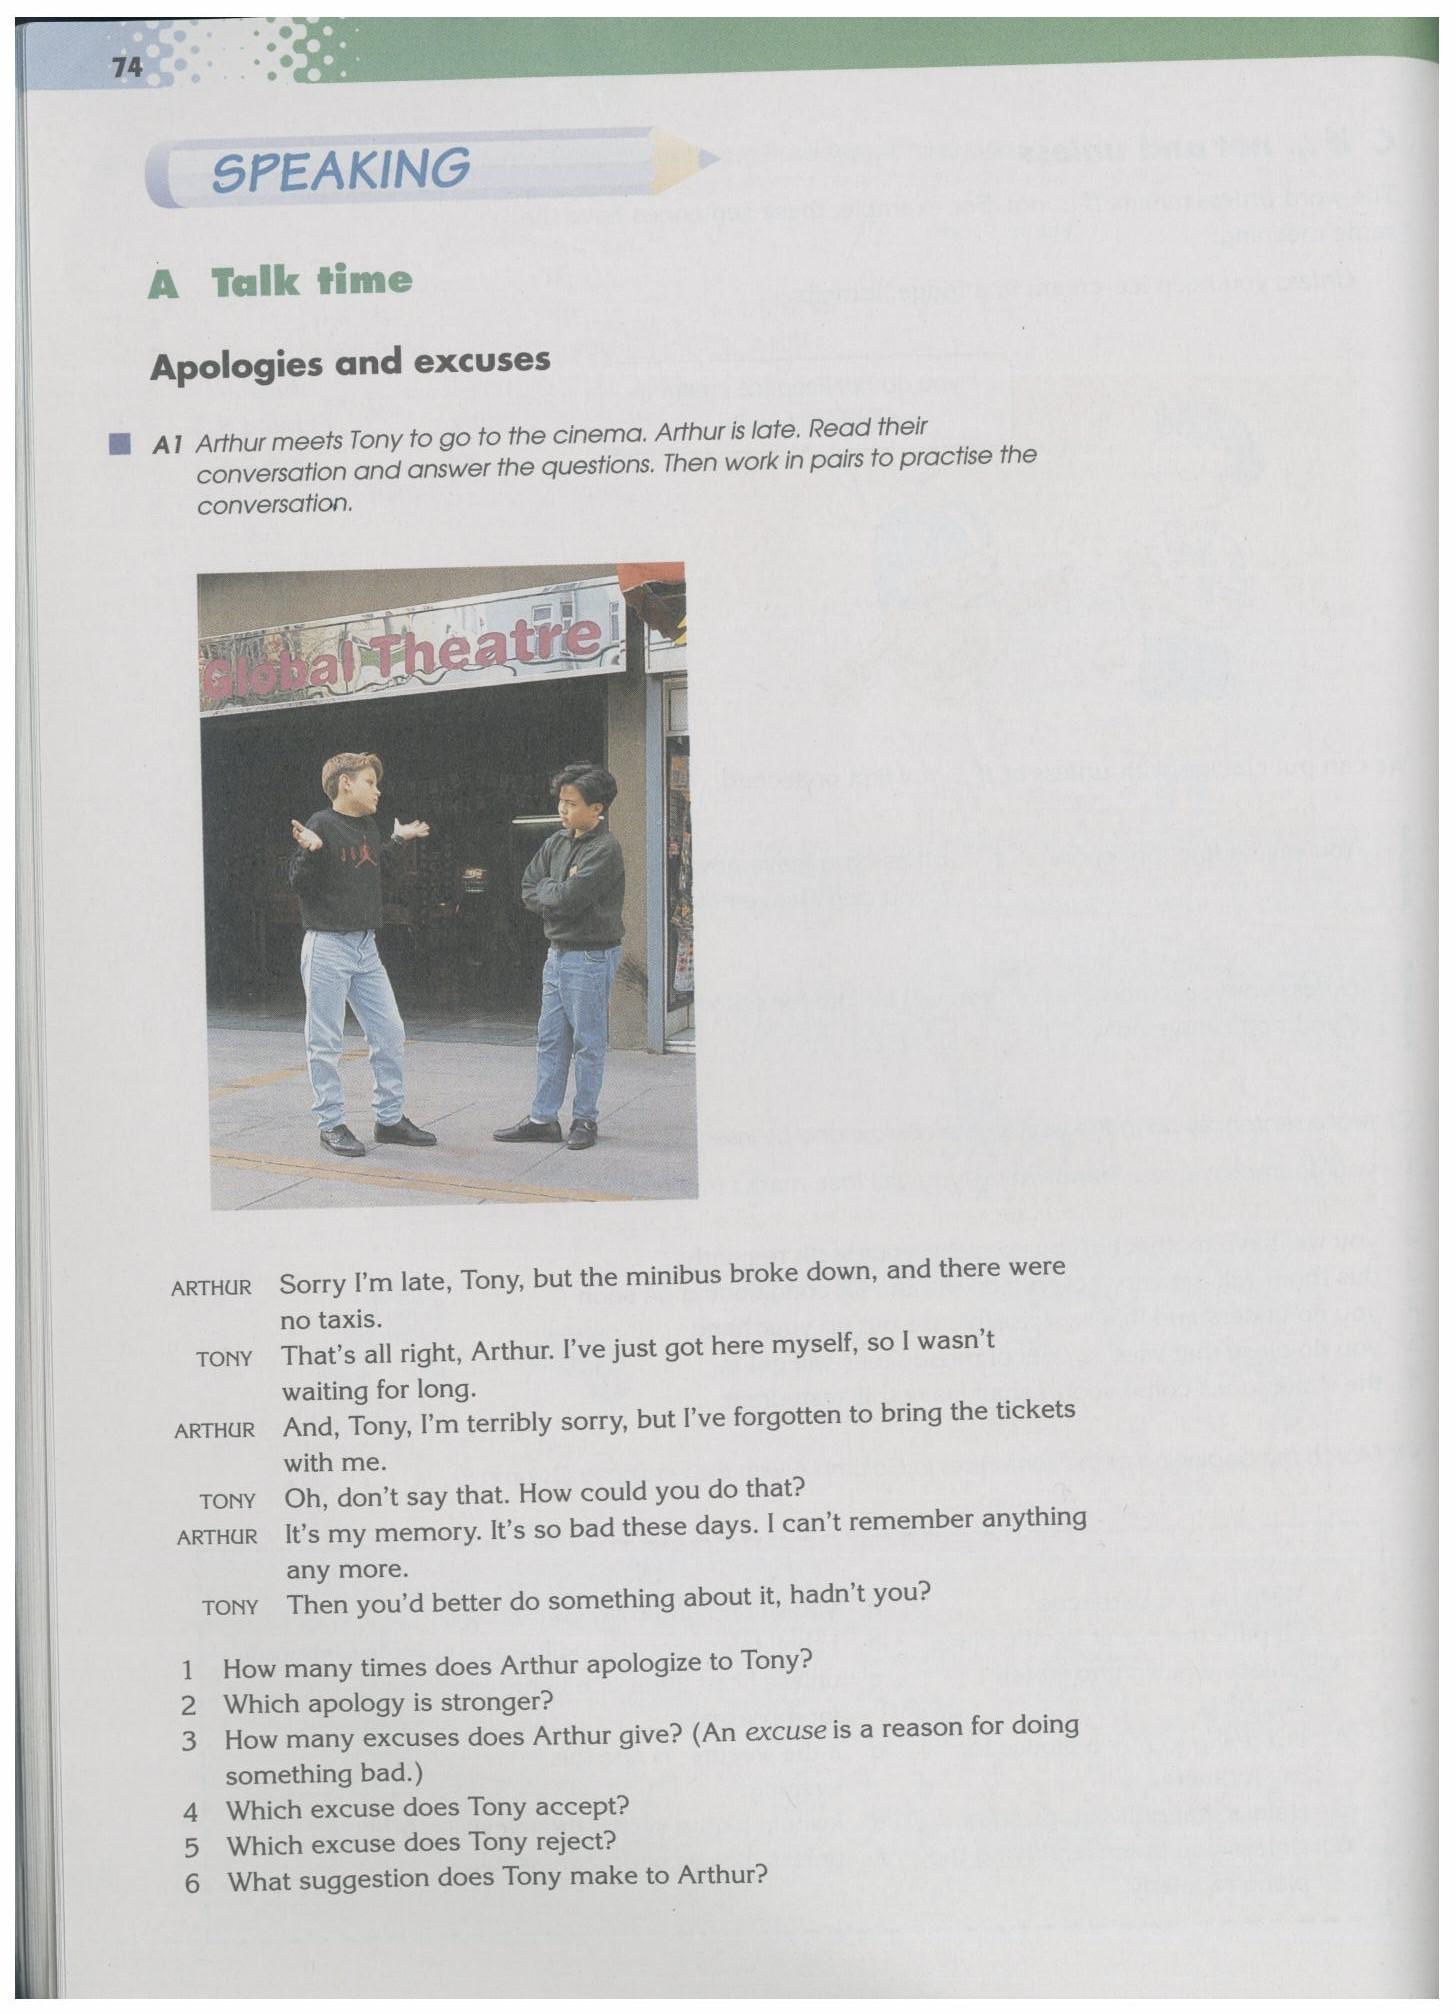 沈阳版牛津英语9A教材Chapter5-Speaking